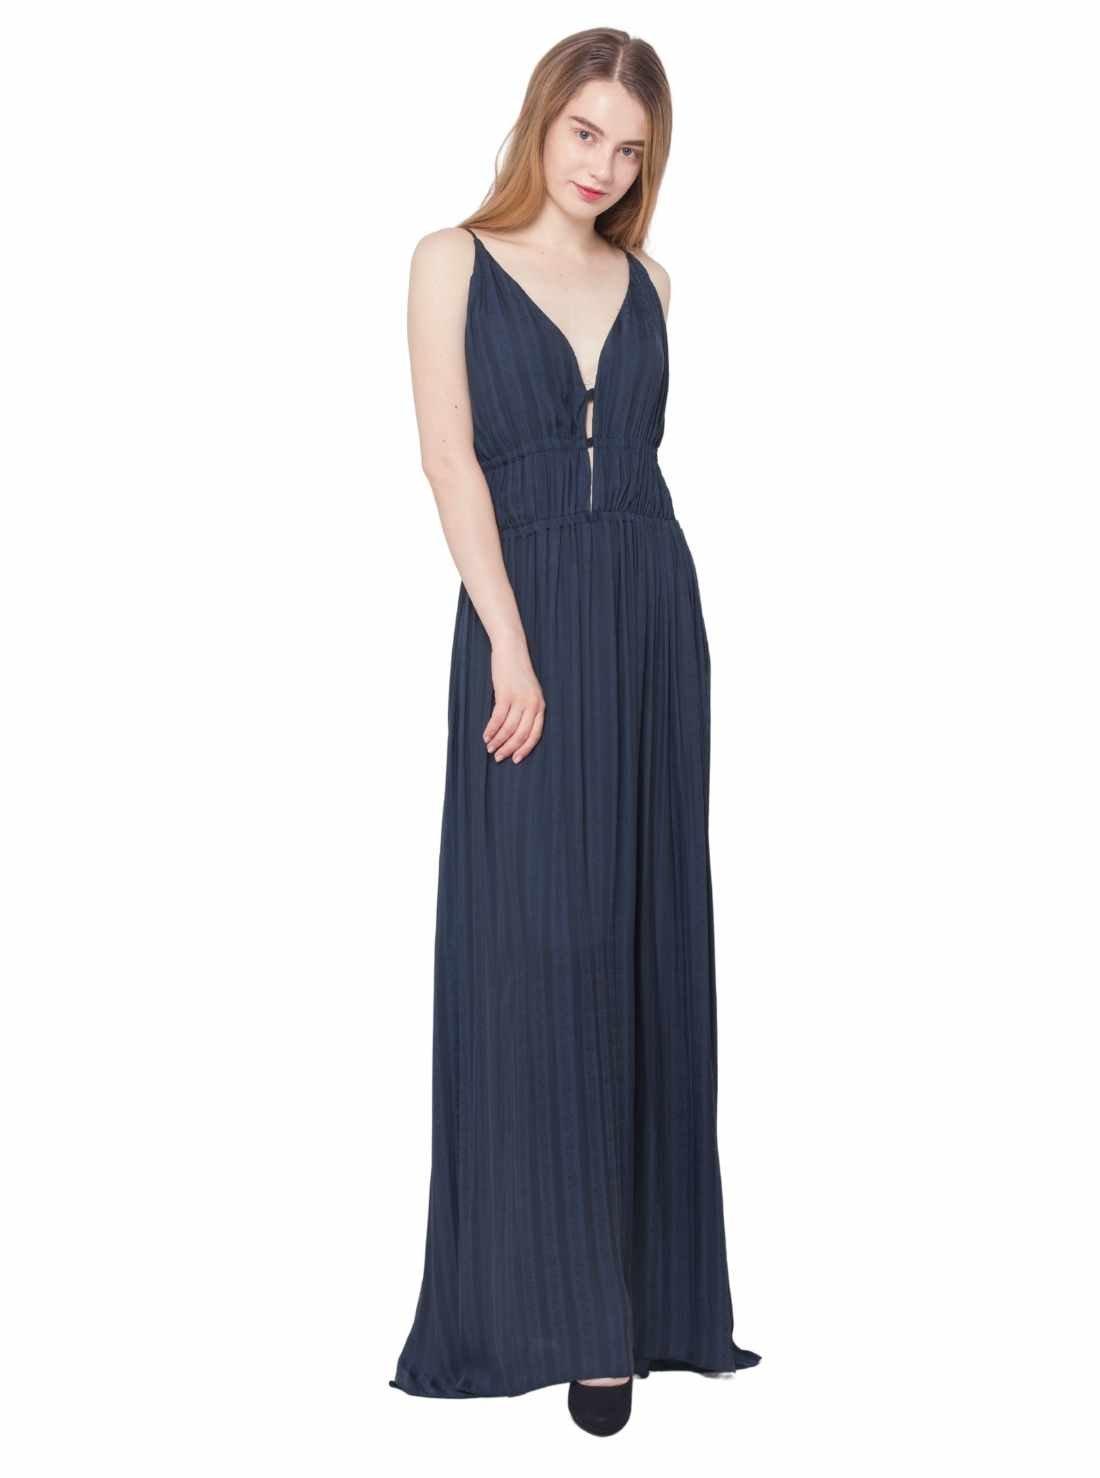 Sleeveless A-Line Silky Jaquard Fabric Maxi Dress